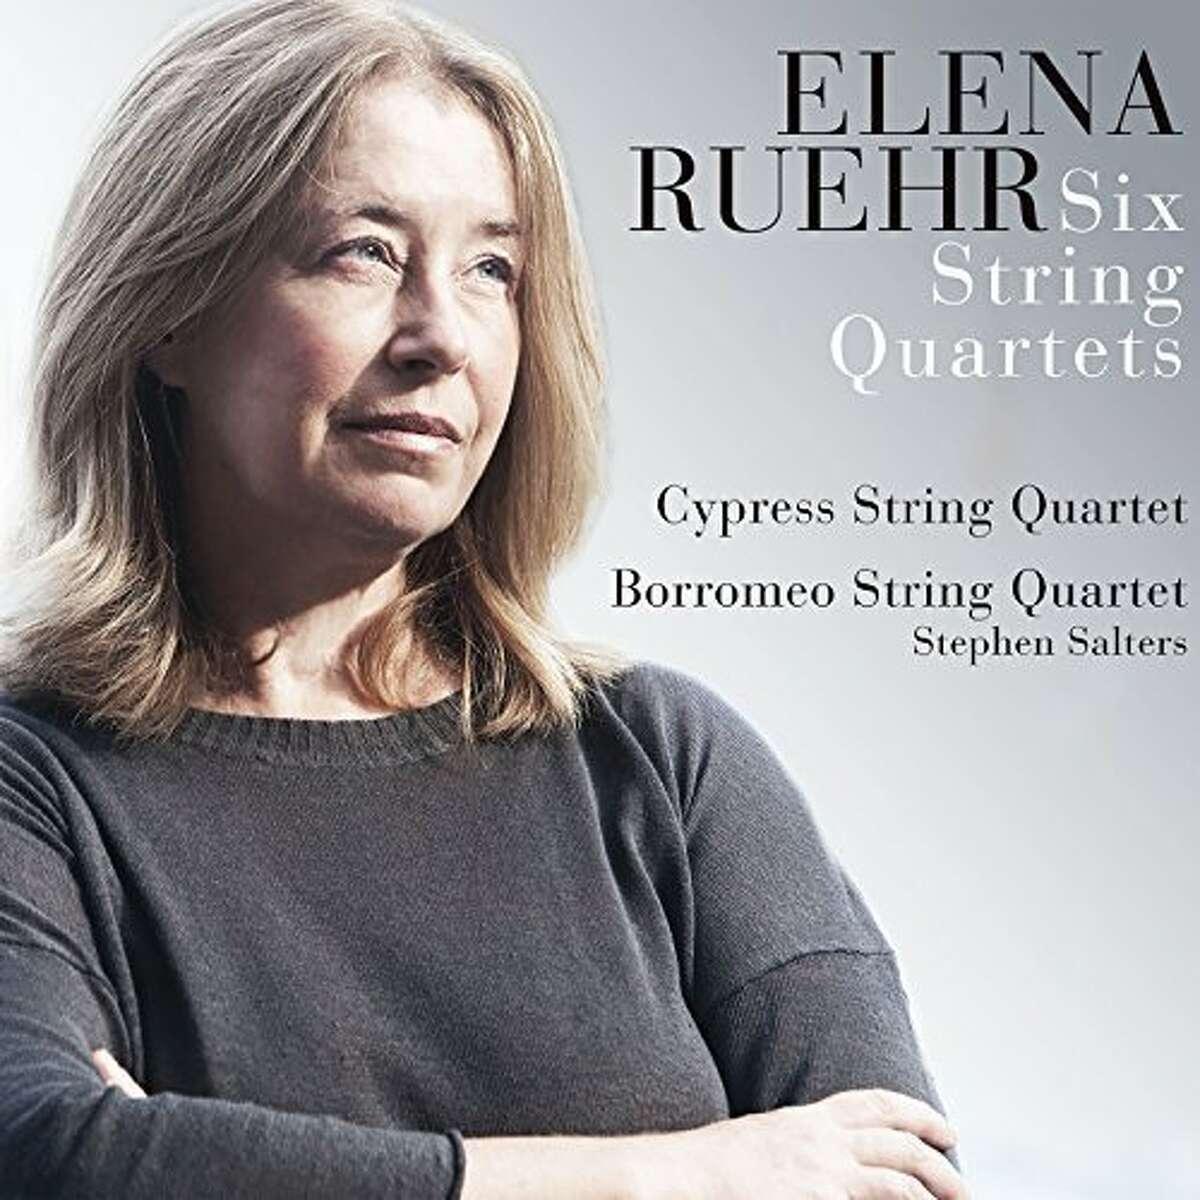 Elena Ruehr, String Quartets